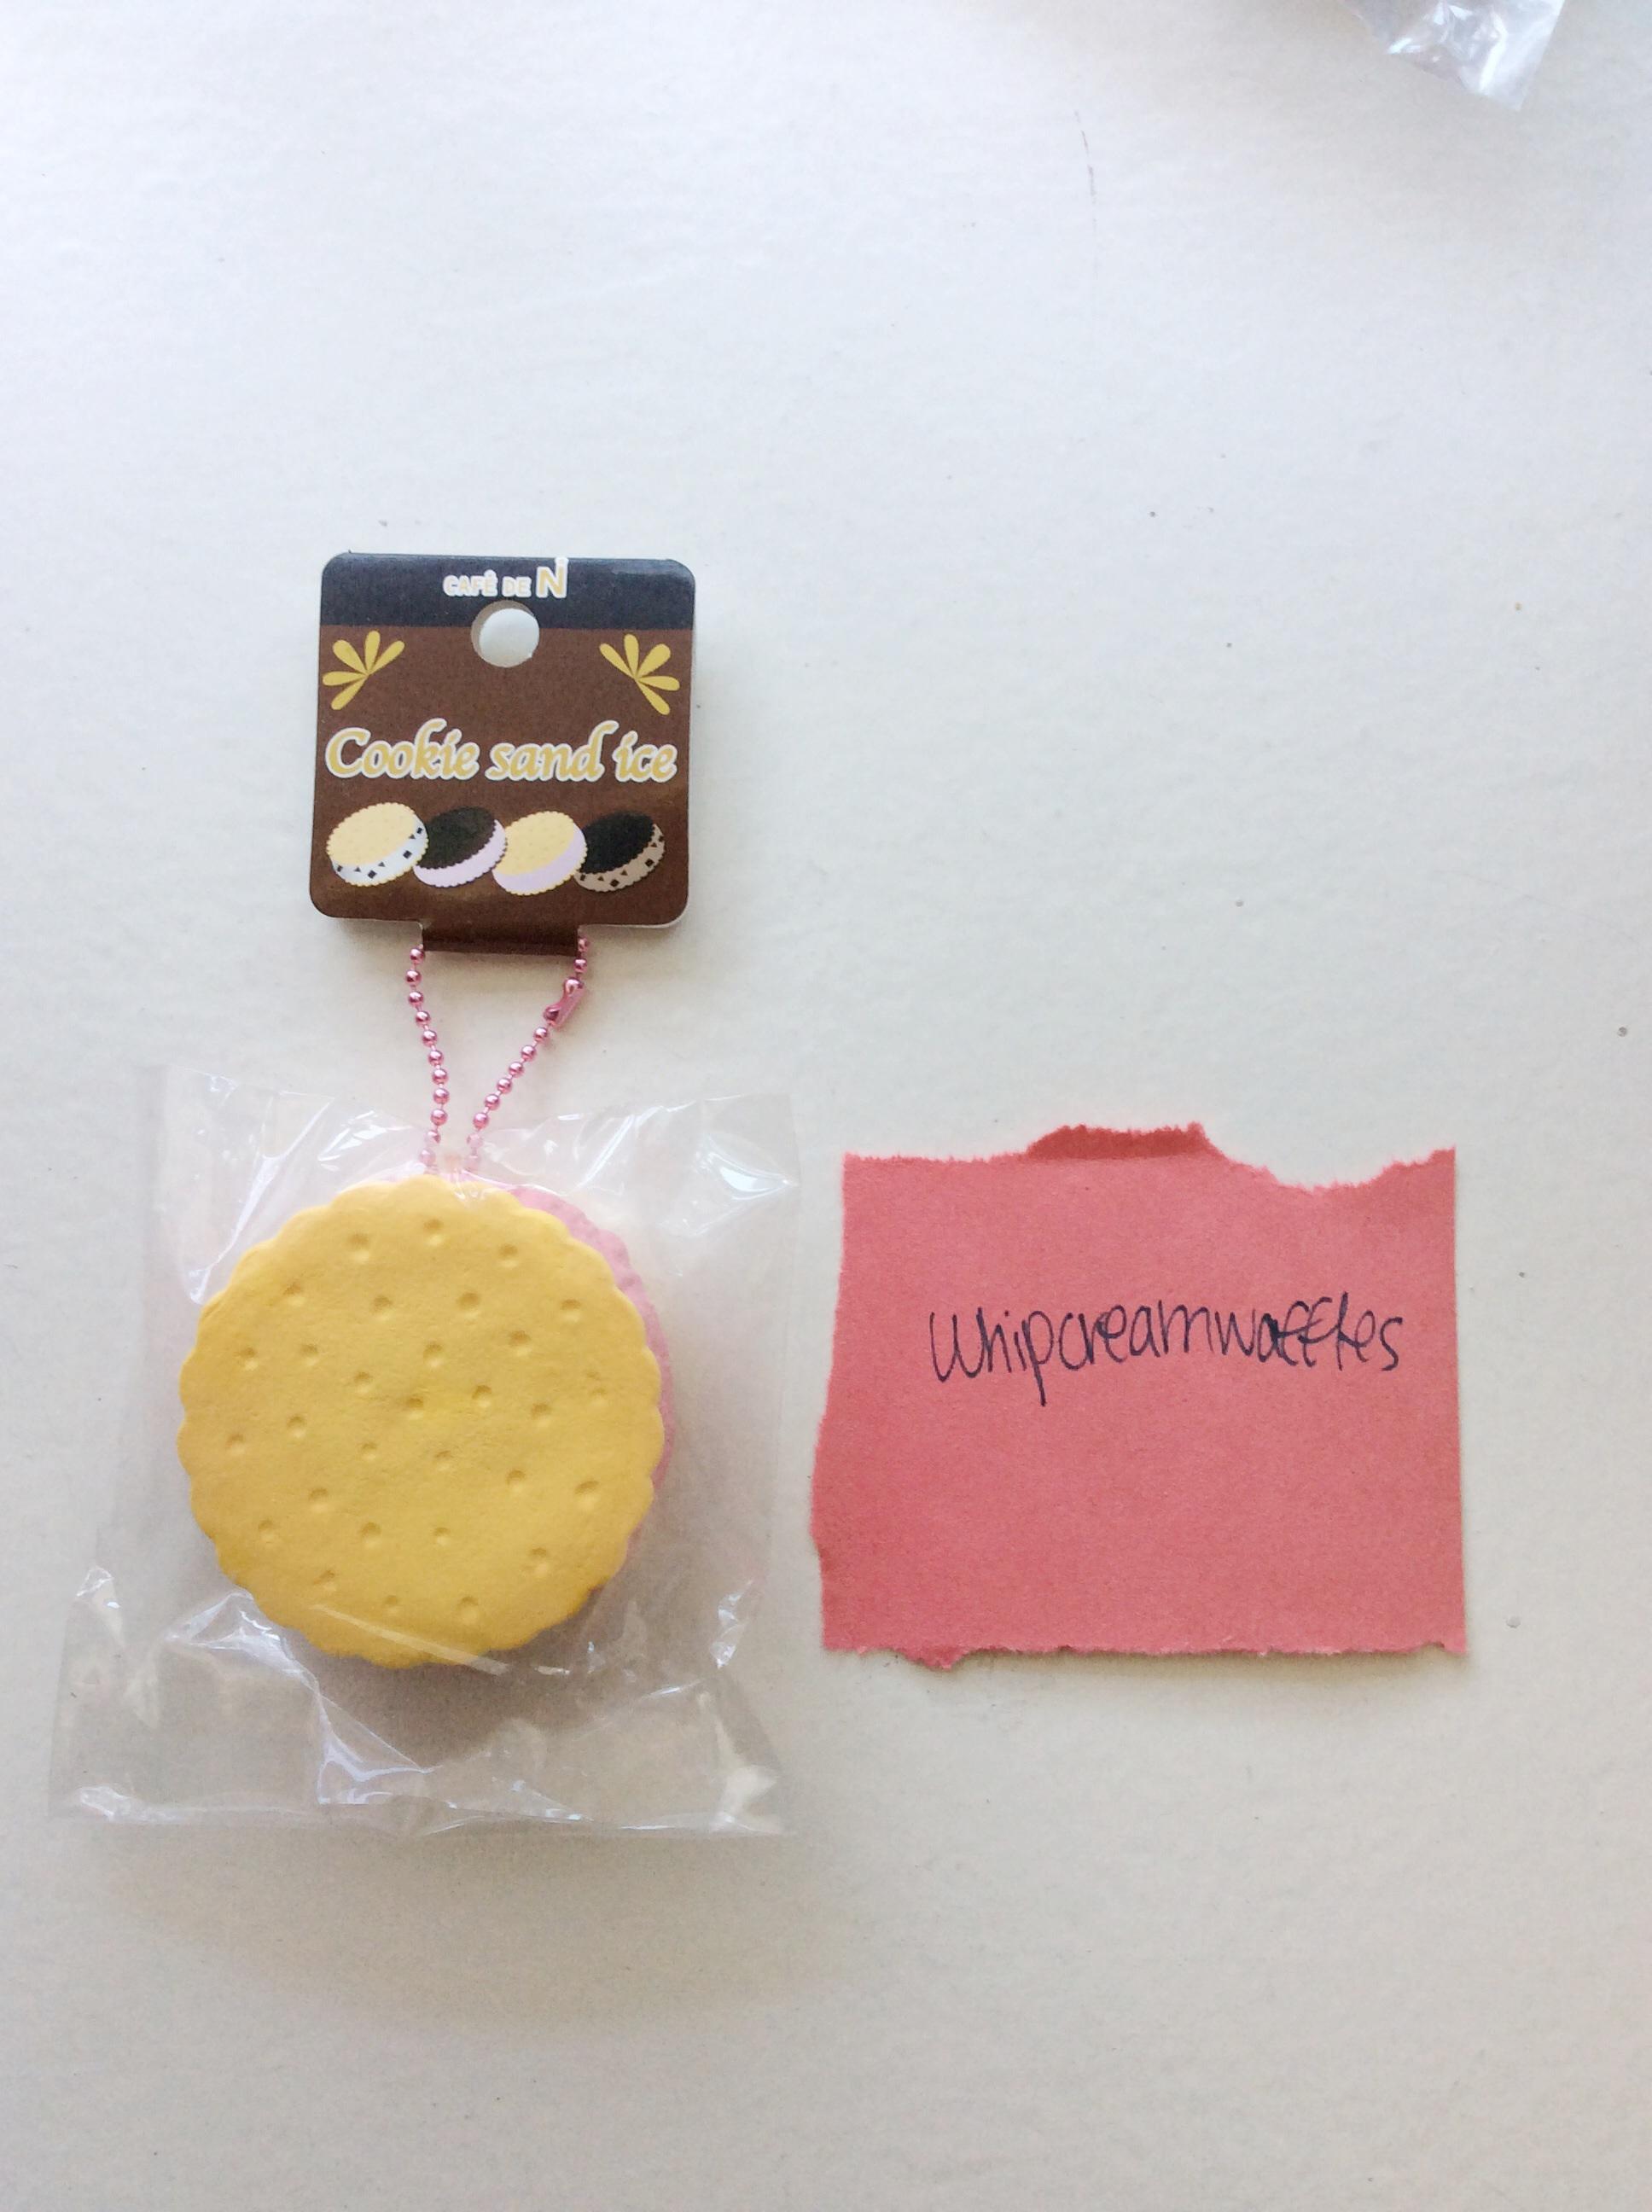 Cafe De N Strawberry Squishy : Rare Reproduced Cafe De N Vanilla Strawberry Ice Cream Sandwich Squishy ? Whipcreamwaffles ...